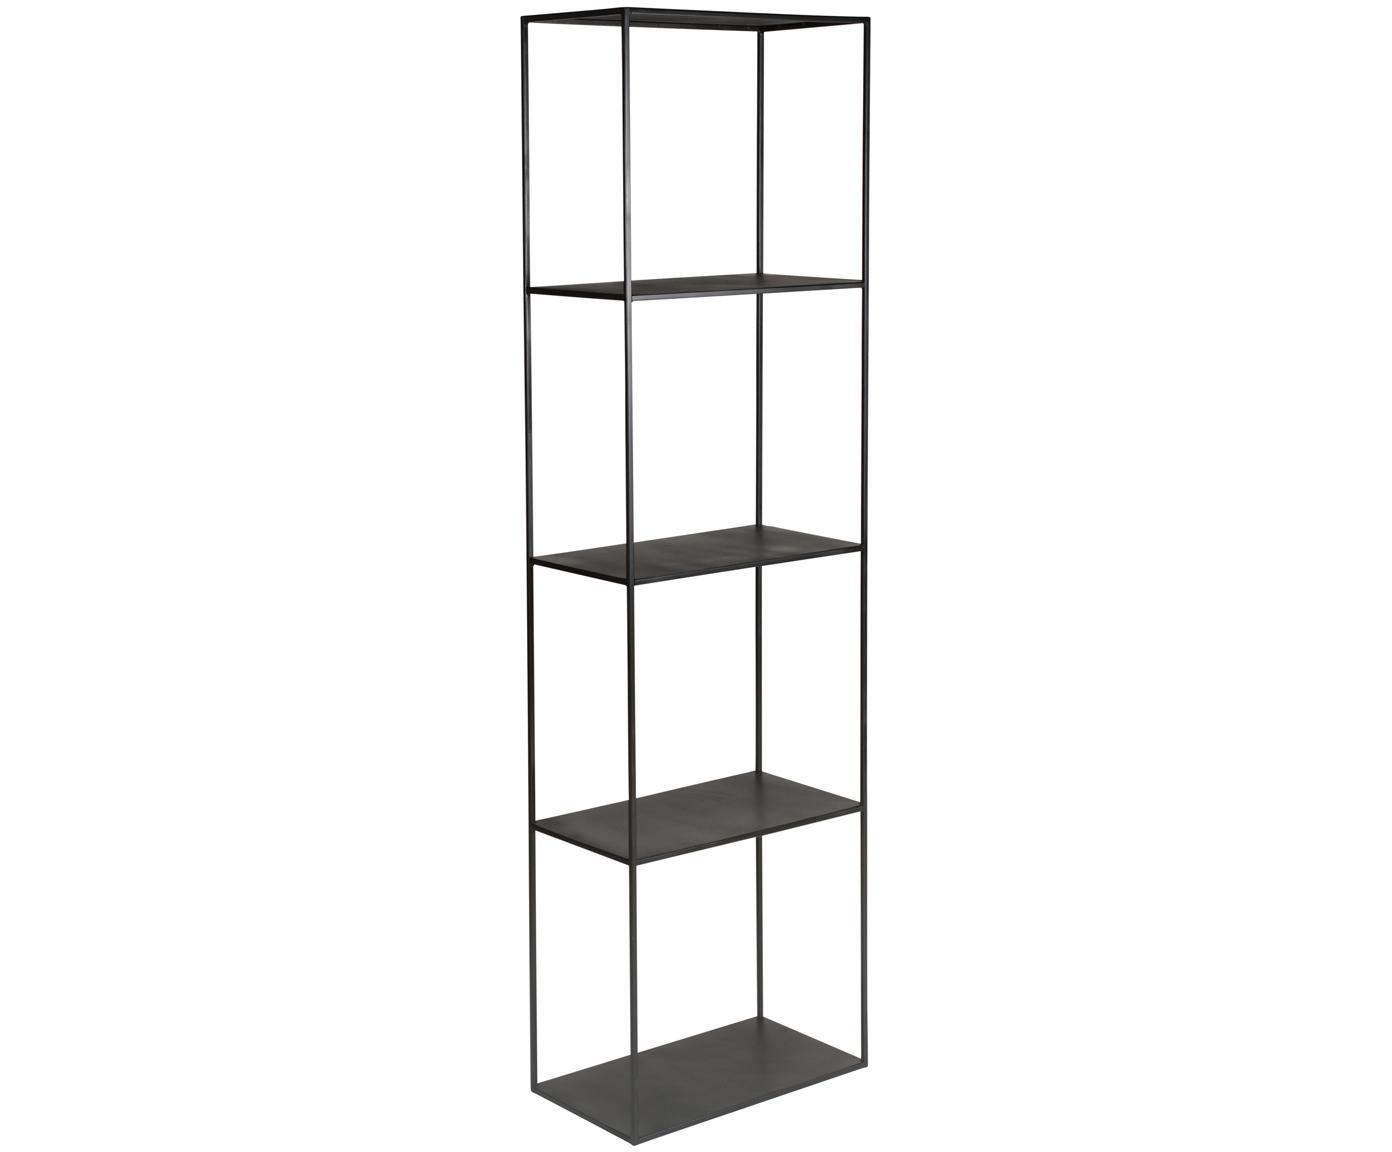 Schwarzes Metall-Regal Expo, Metall, pulverbeschichtet, Schwarz, 50 x 180 cm